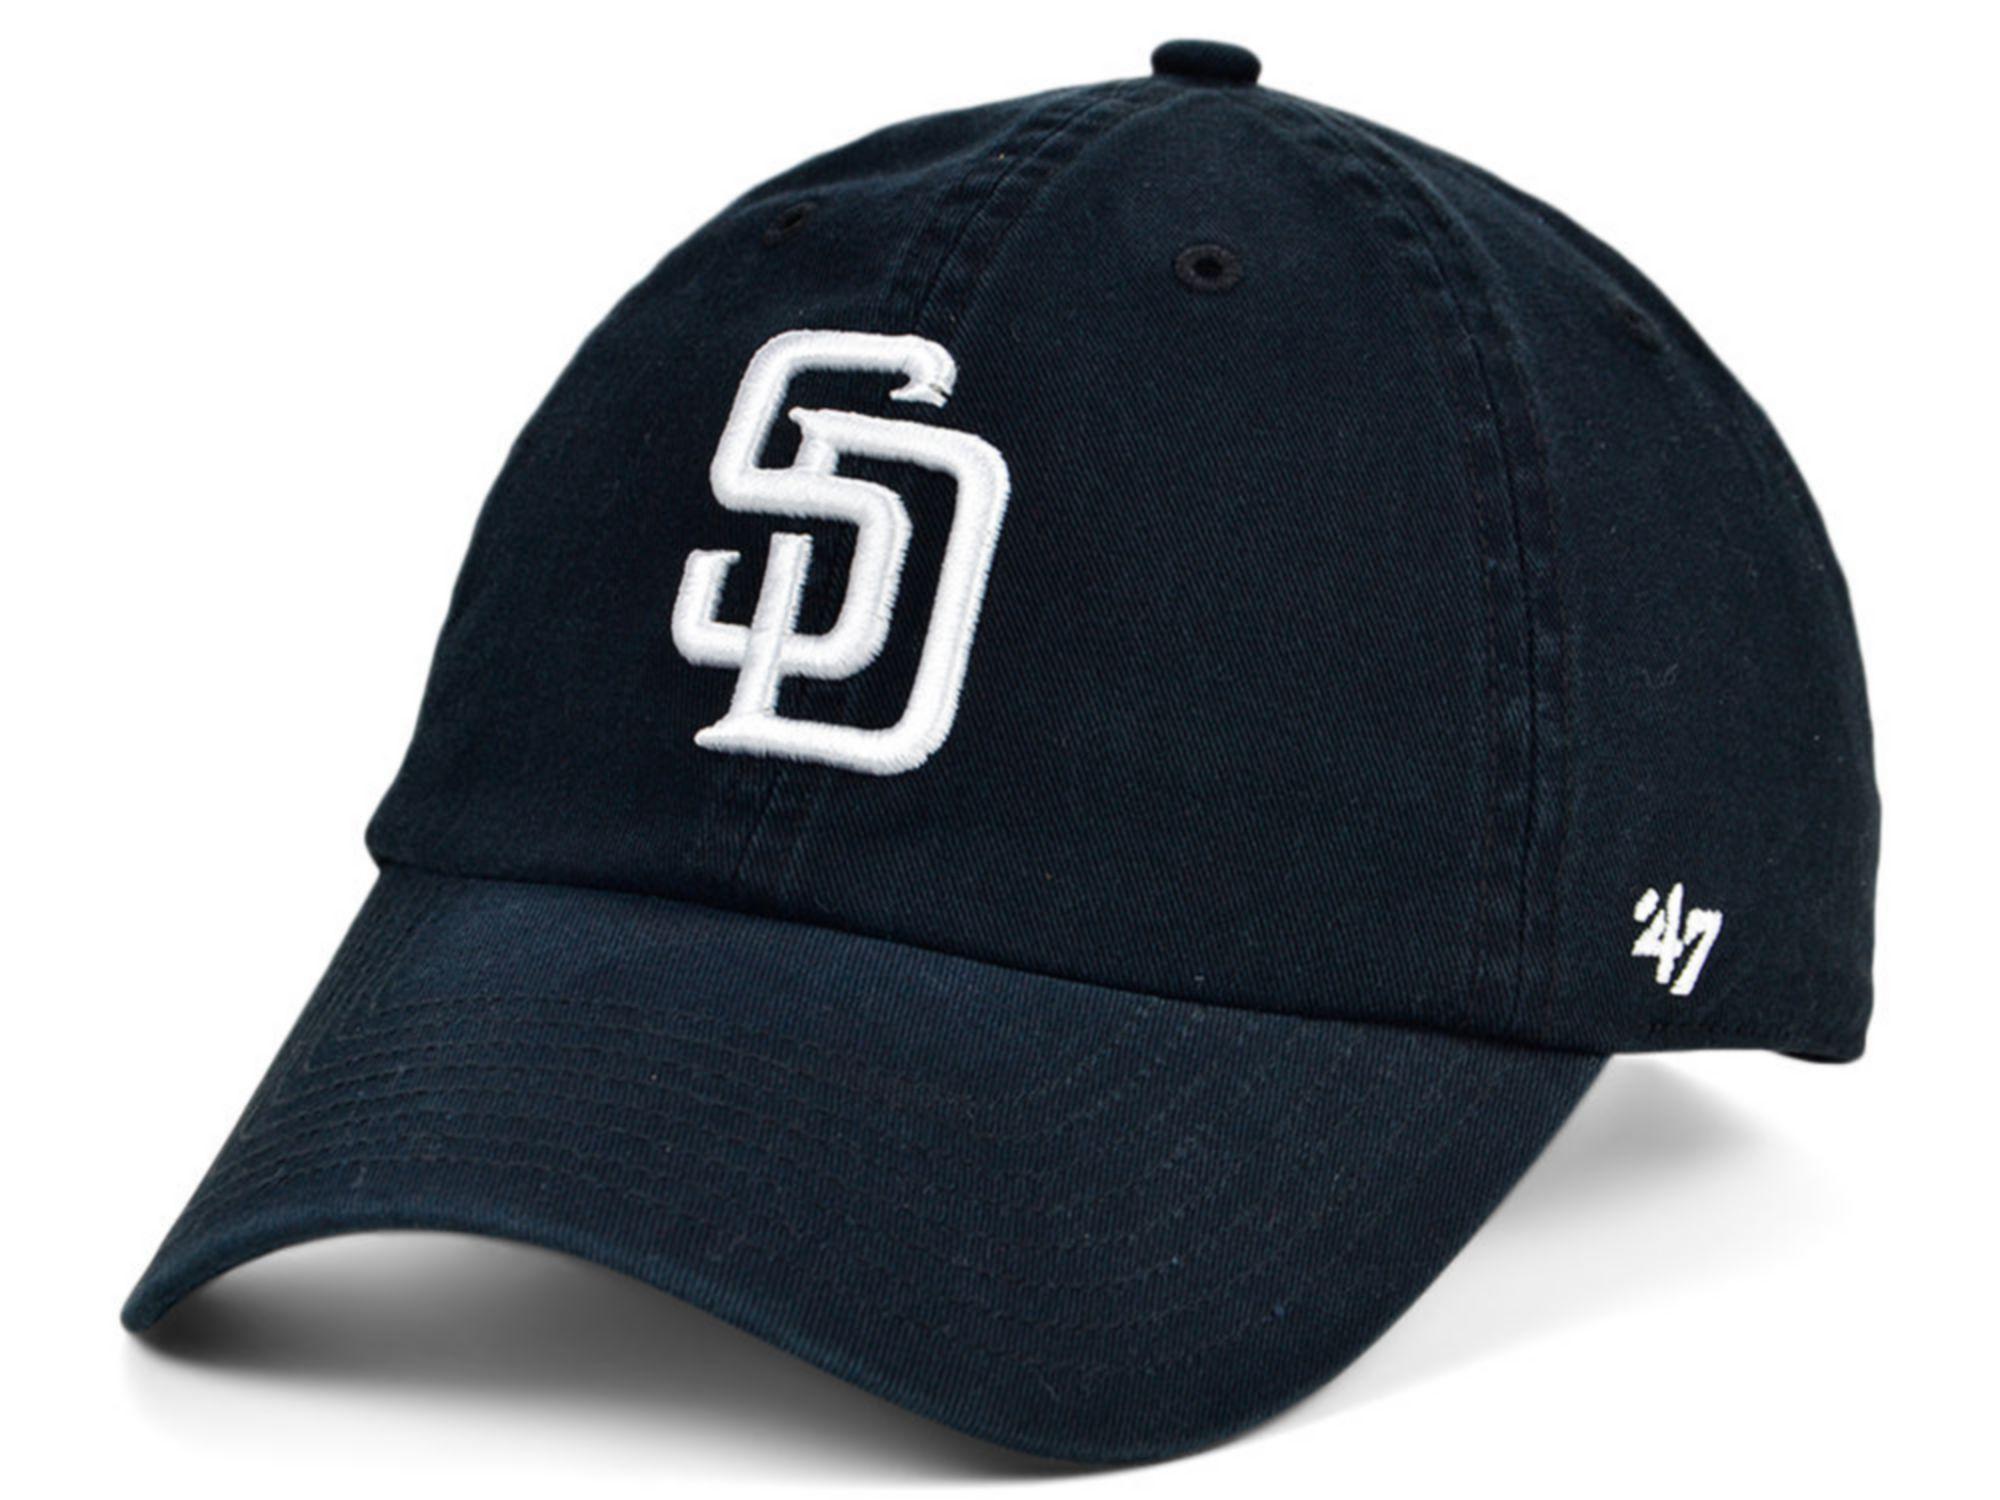 '47 Brand San Diego Padres Black White CLEAN UP Cap & Reviews - MLB - Sports Fan Shop - Macy's